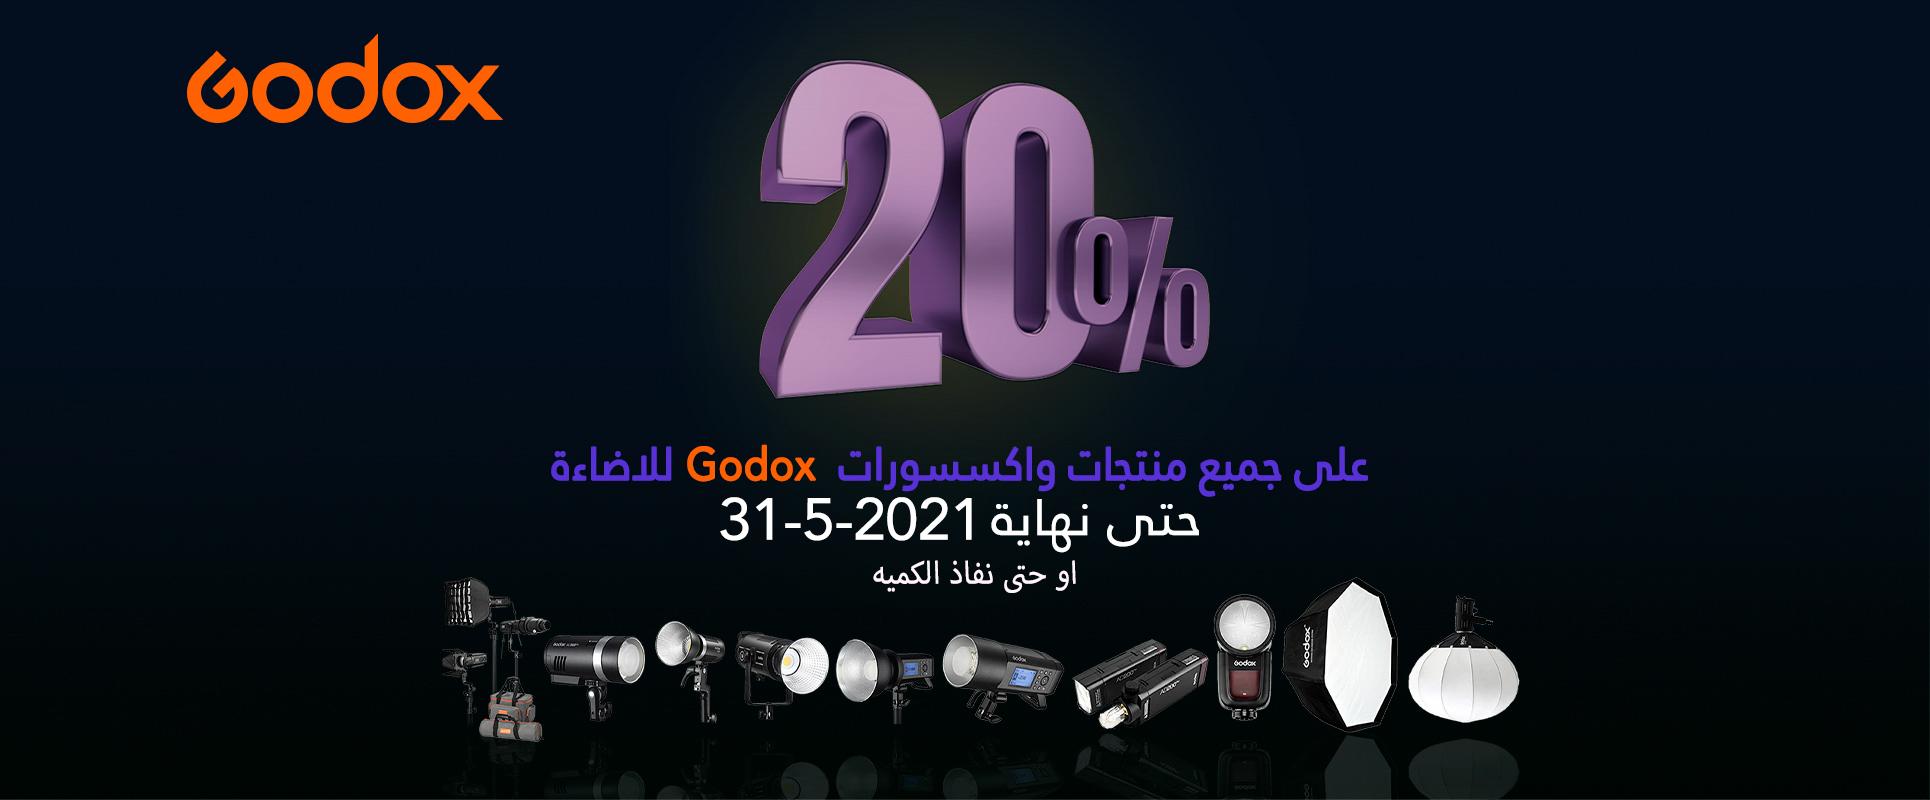 Godox Offer